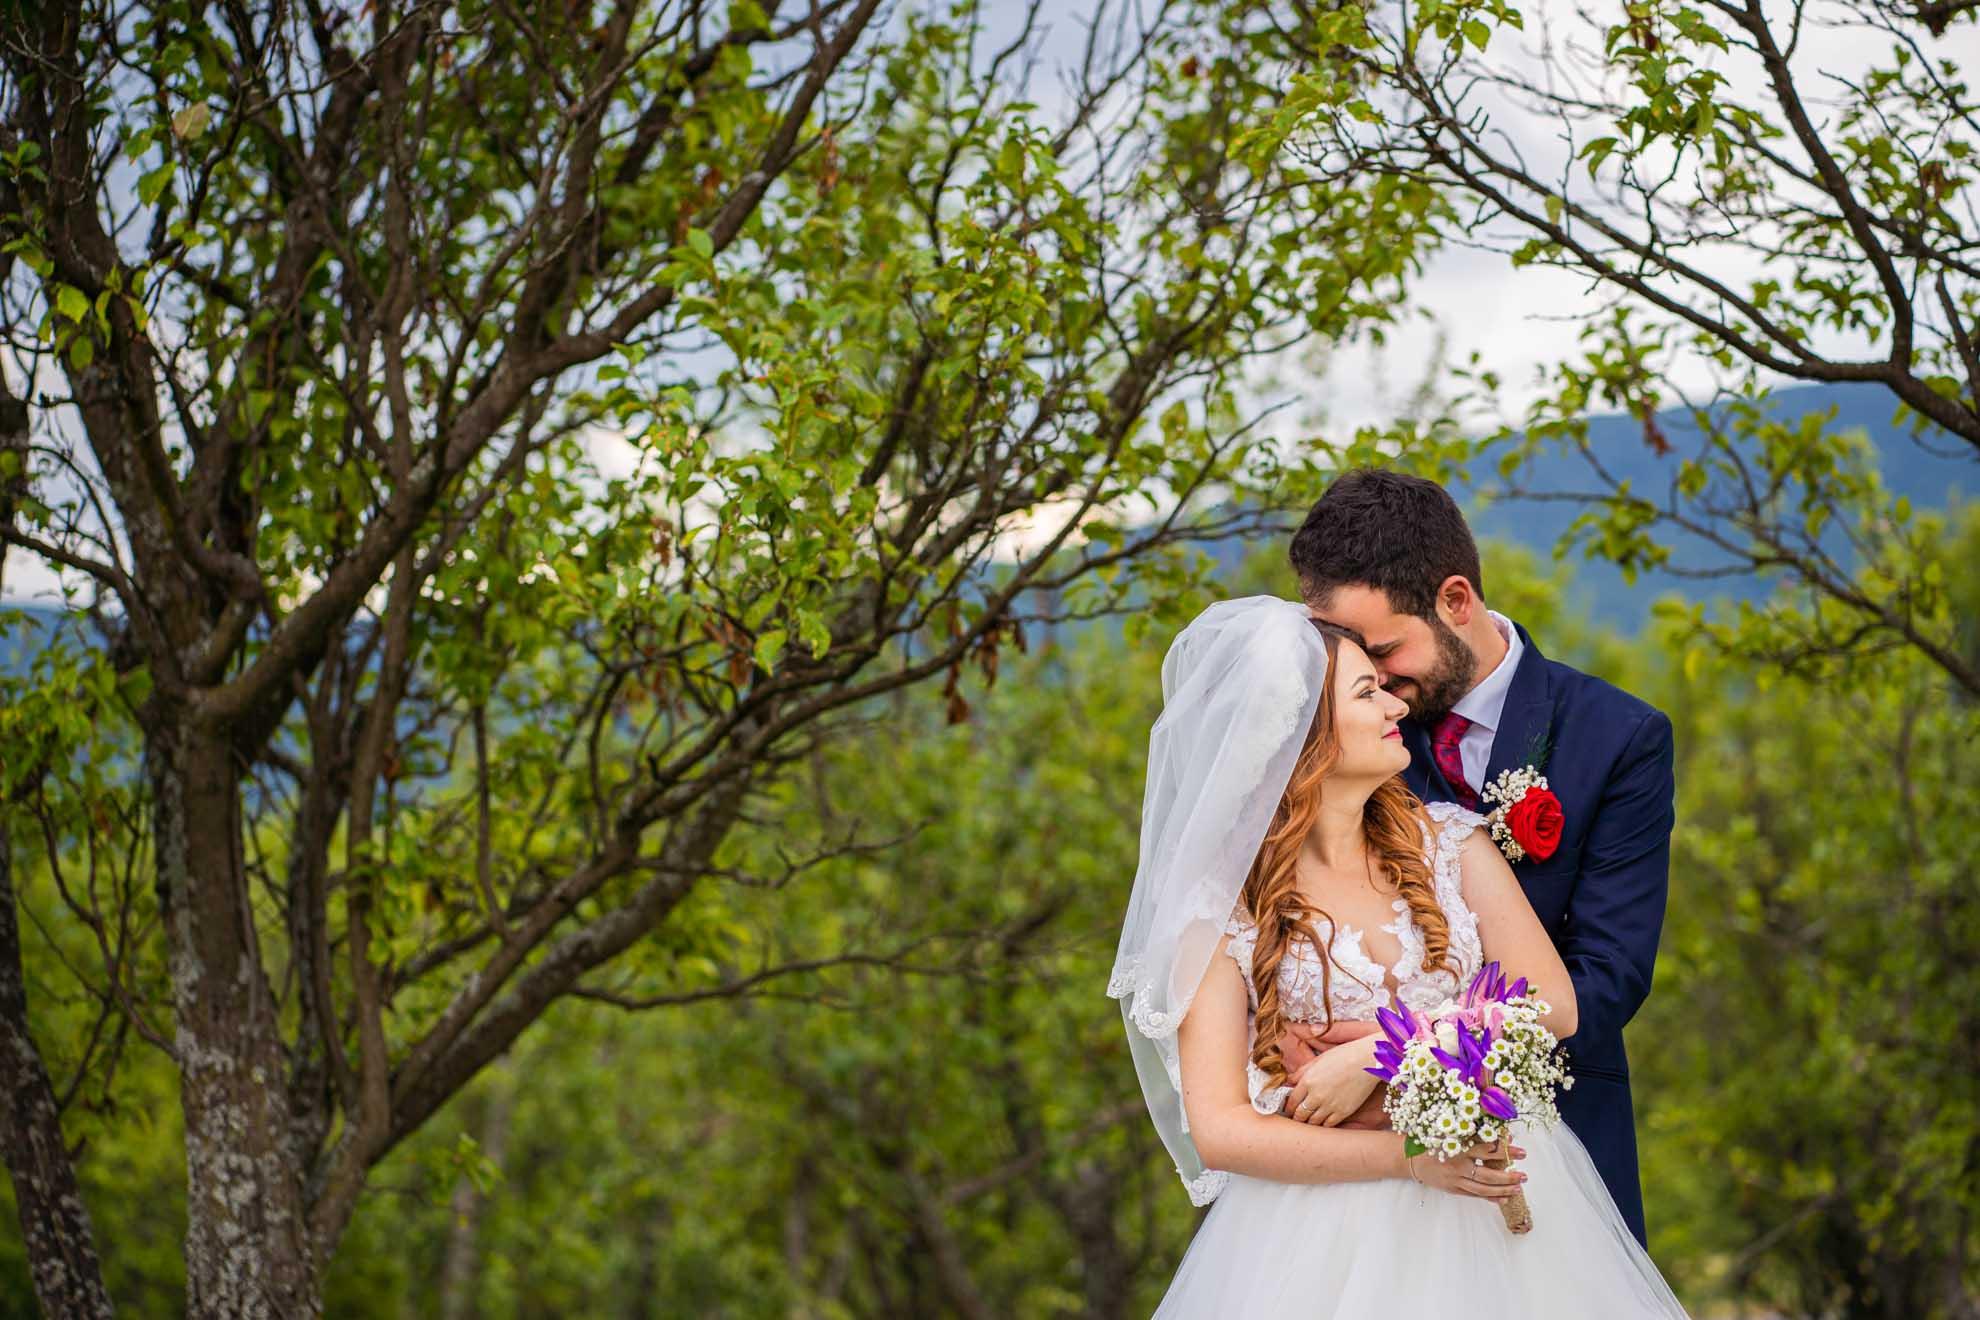 Fotografie nunta Zalau – Misu si Lavi